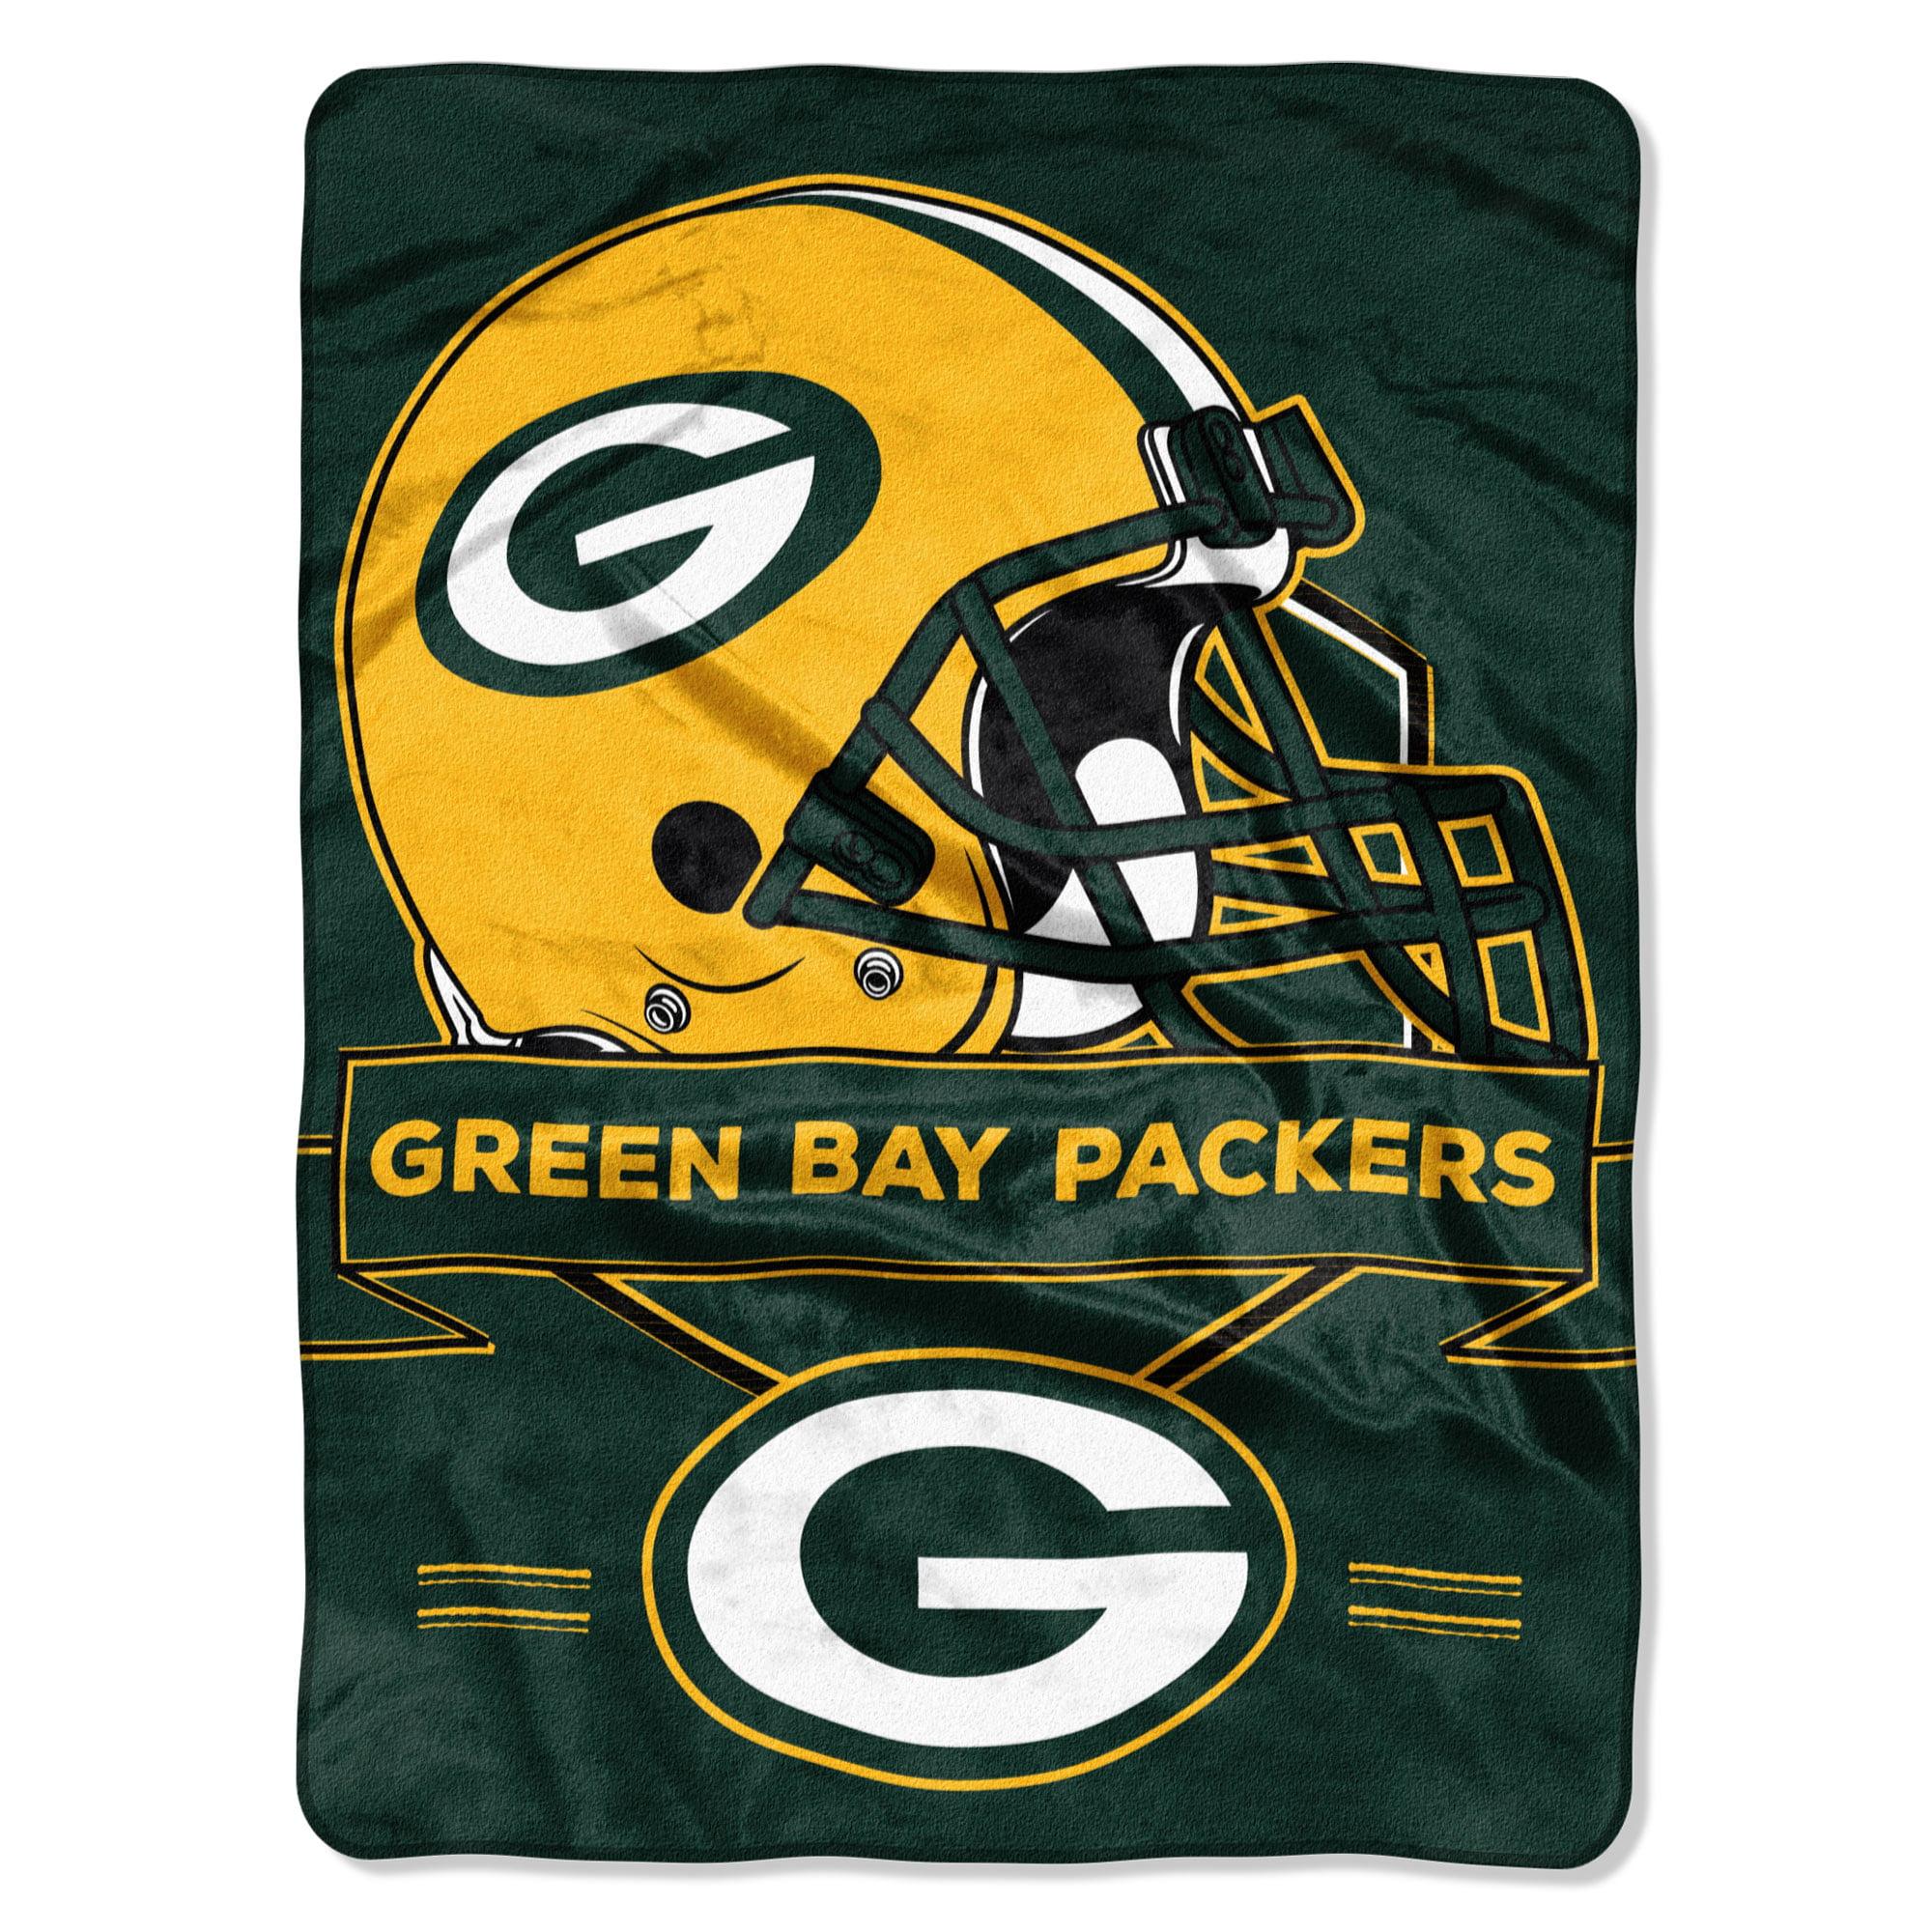 "Green Bay Packers The Northwest Company 60"" x 80"" Prestige Raschel Blanket - No Size"